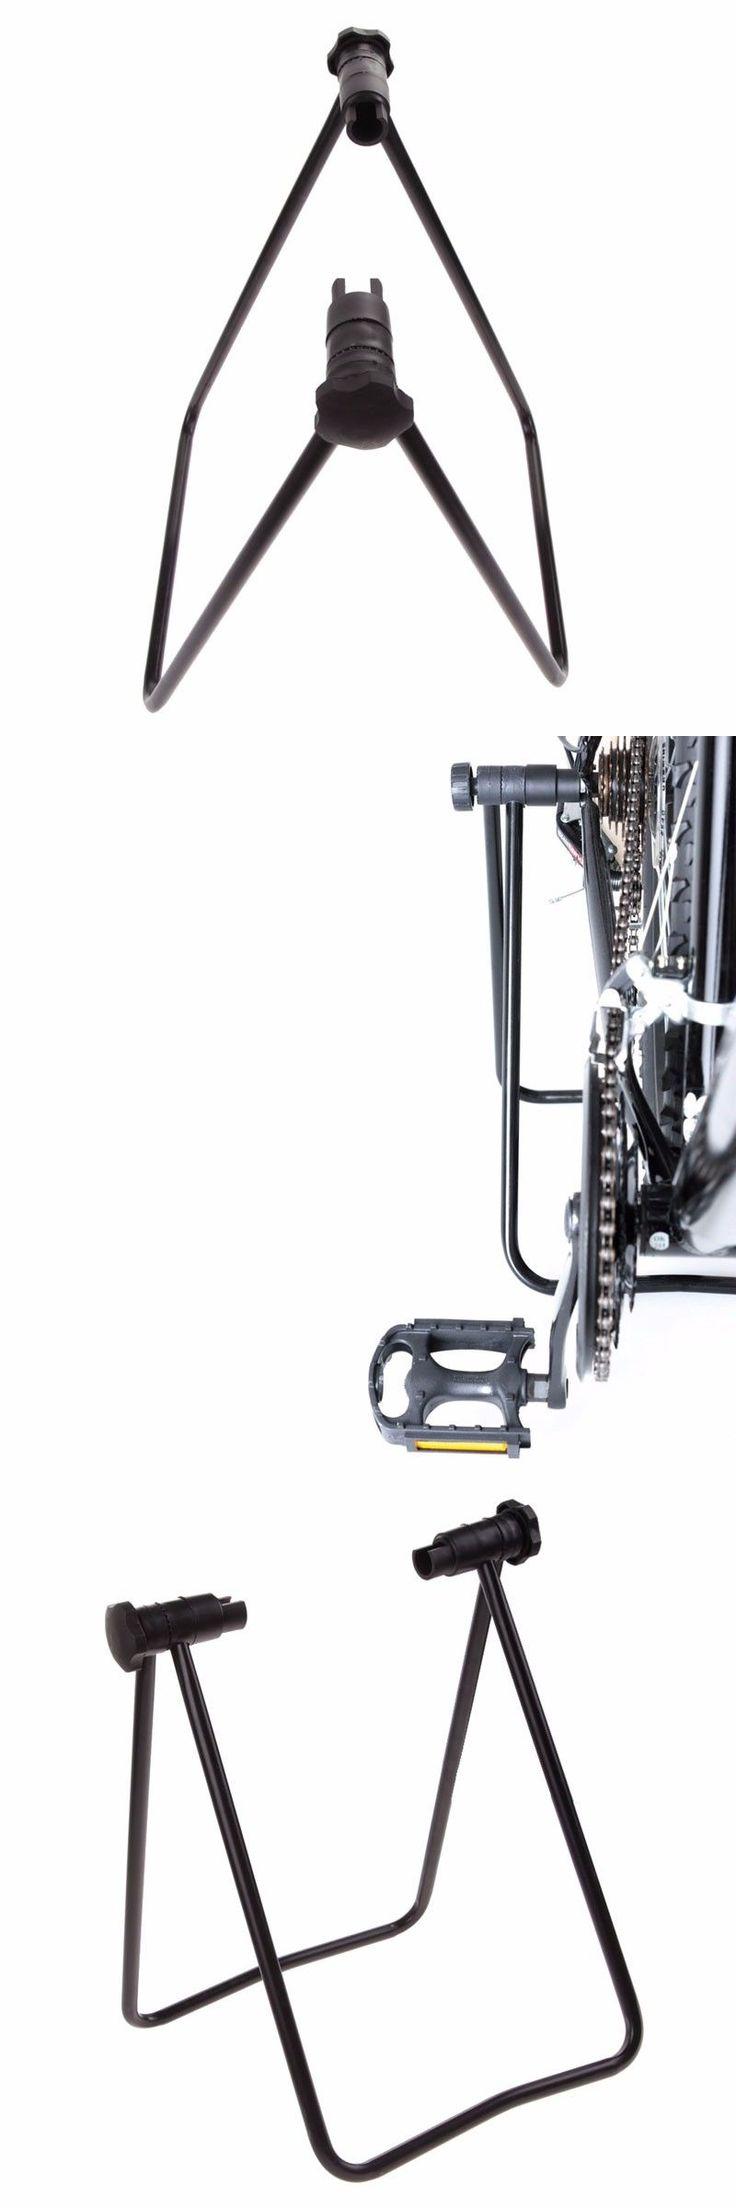 U Shape Bike Cycling Folding Wheel Hub Kickstand Repair Parking Rack Stands New #bikerepairstand